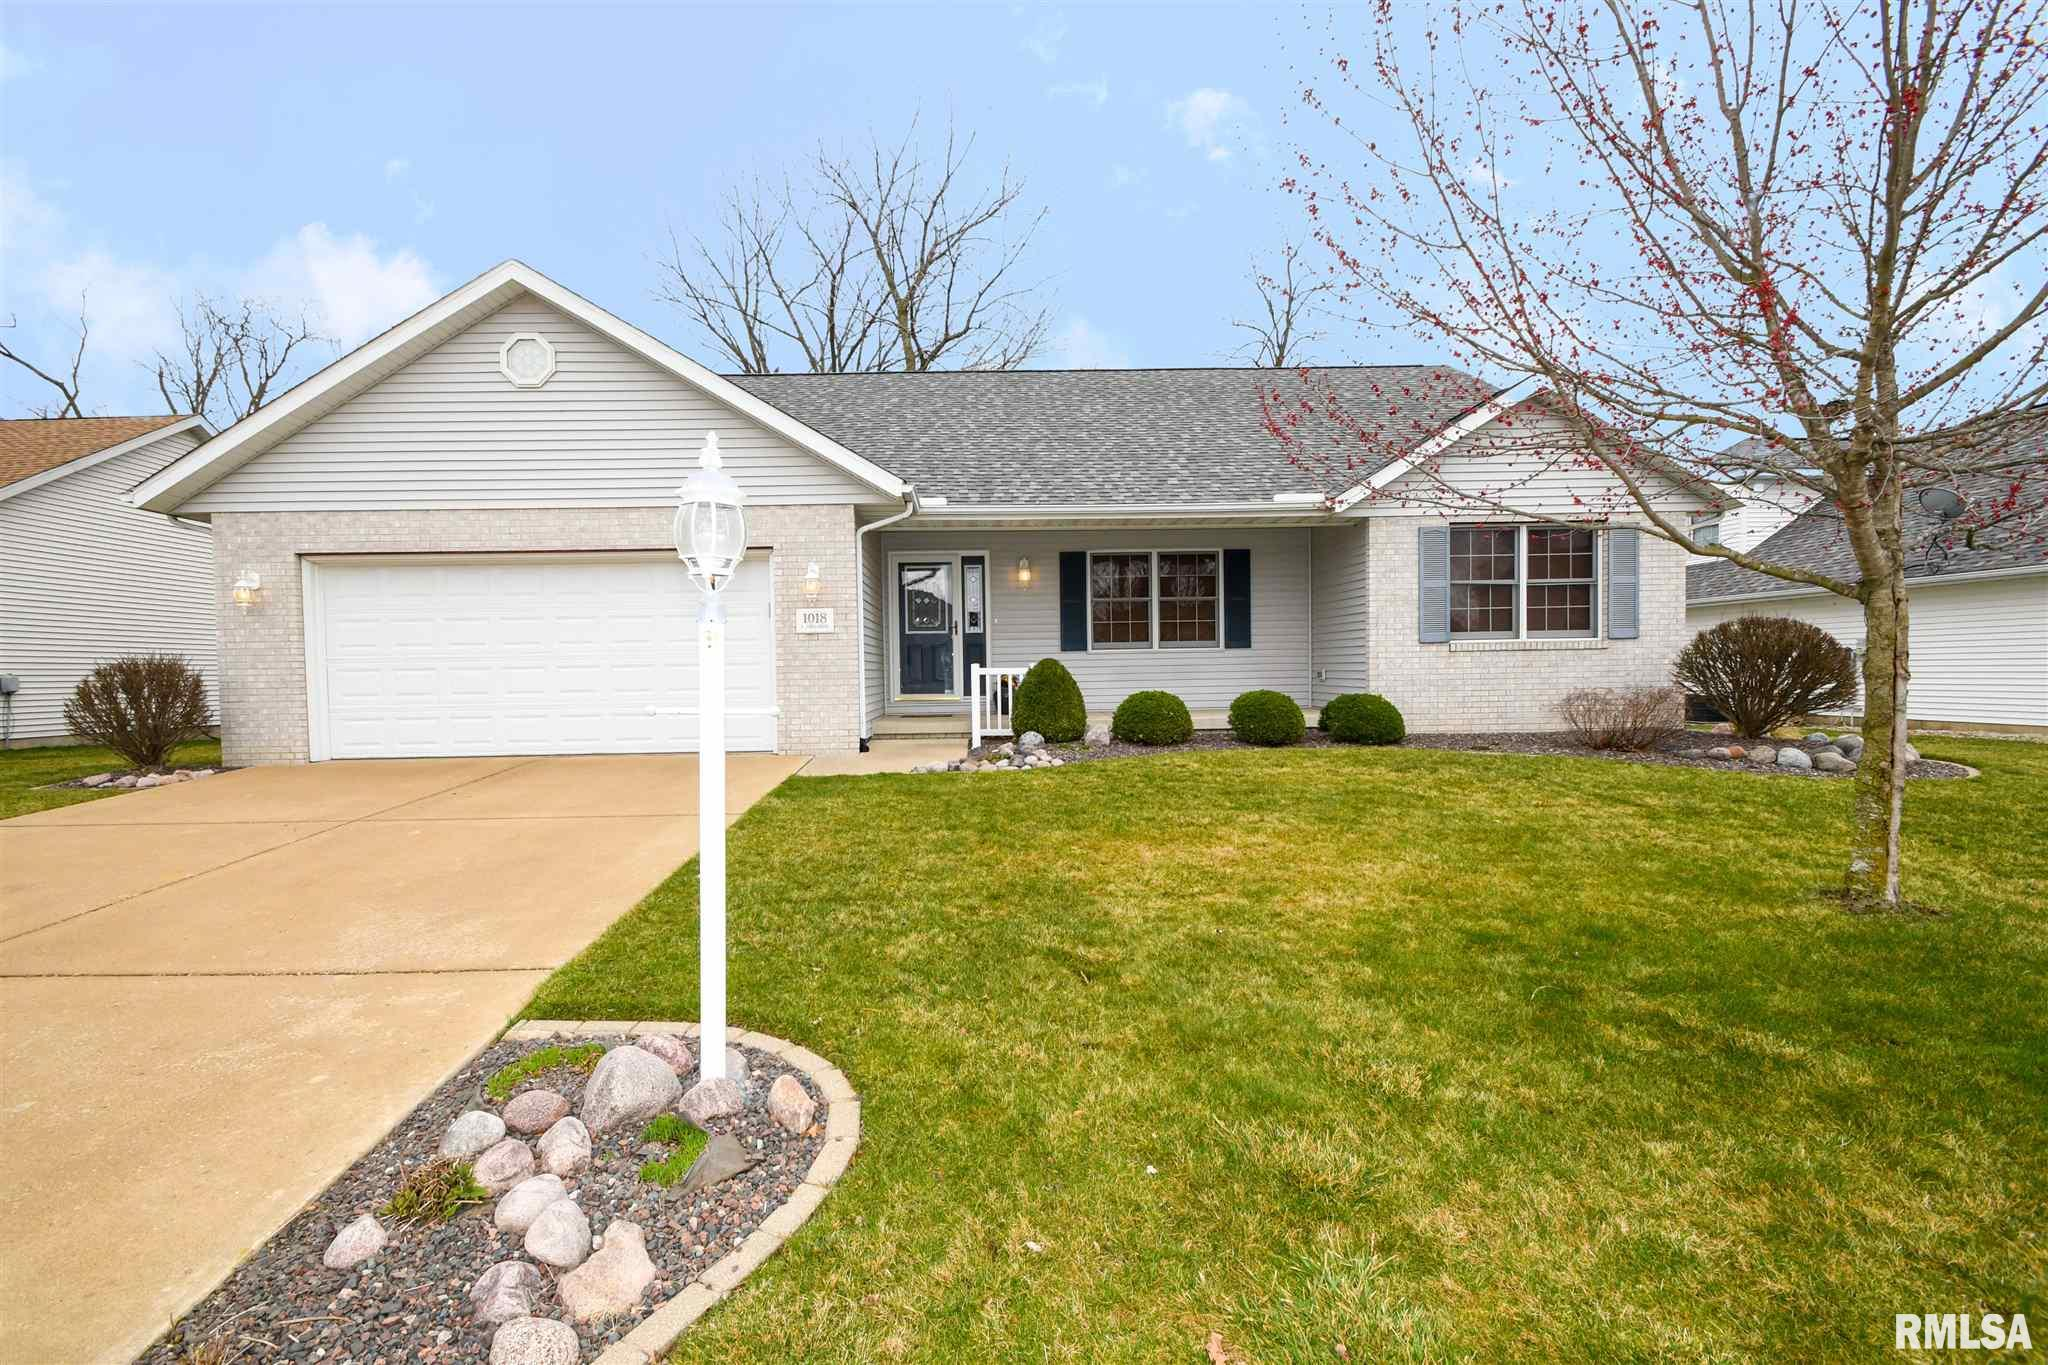 1018 S JOHANSON Property Photo - Peoria, IL real estate listing